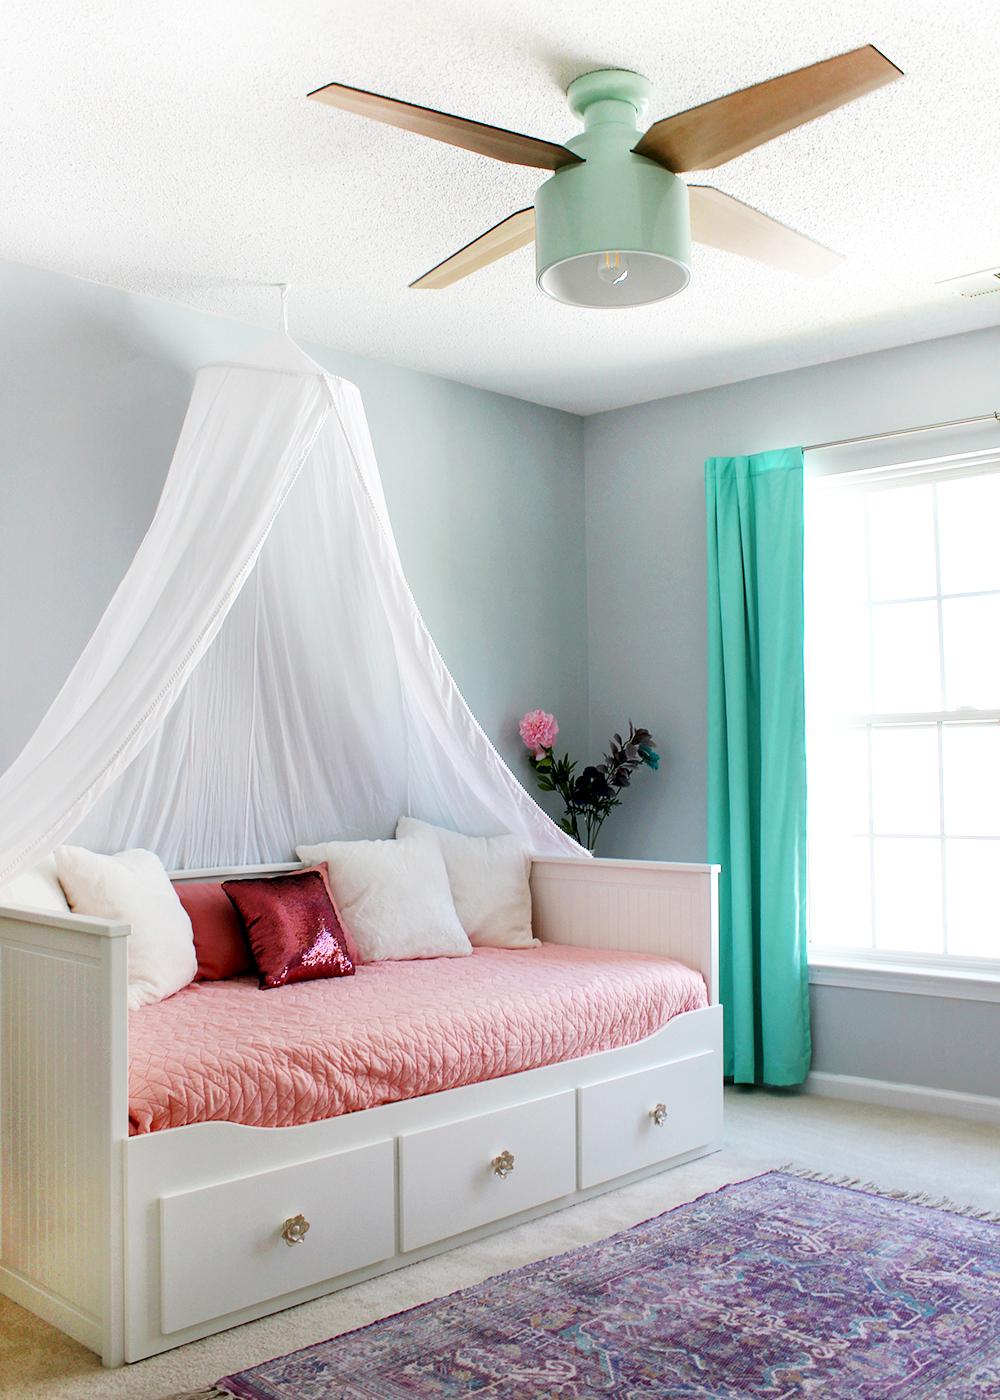 Hunter Fan Cranbrook Design (mint) in a girl's bedroom